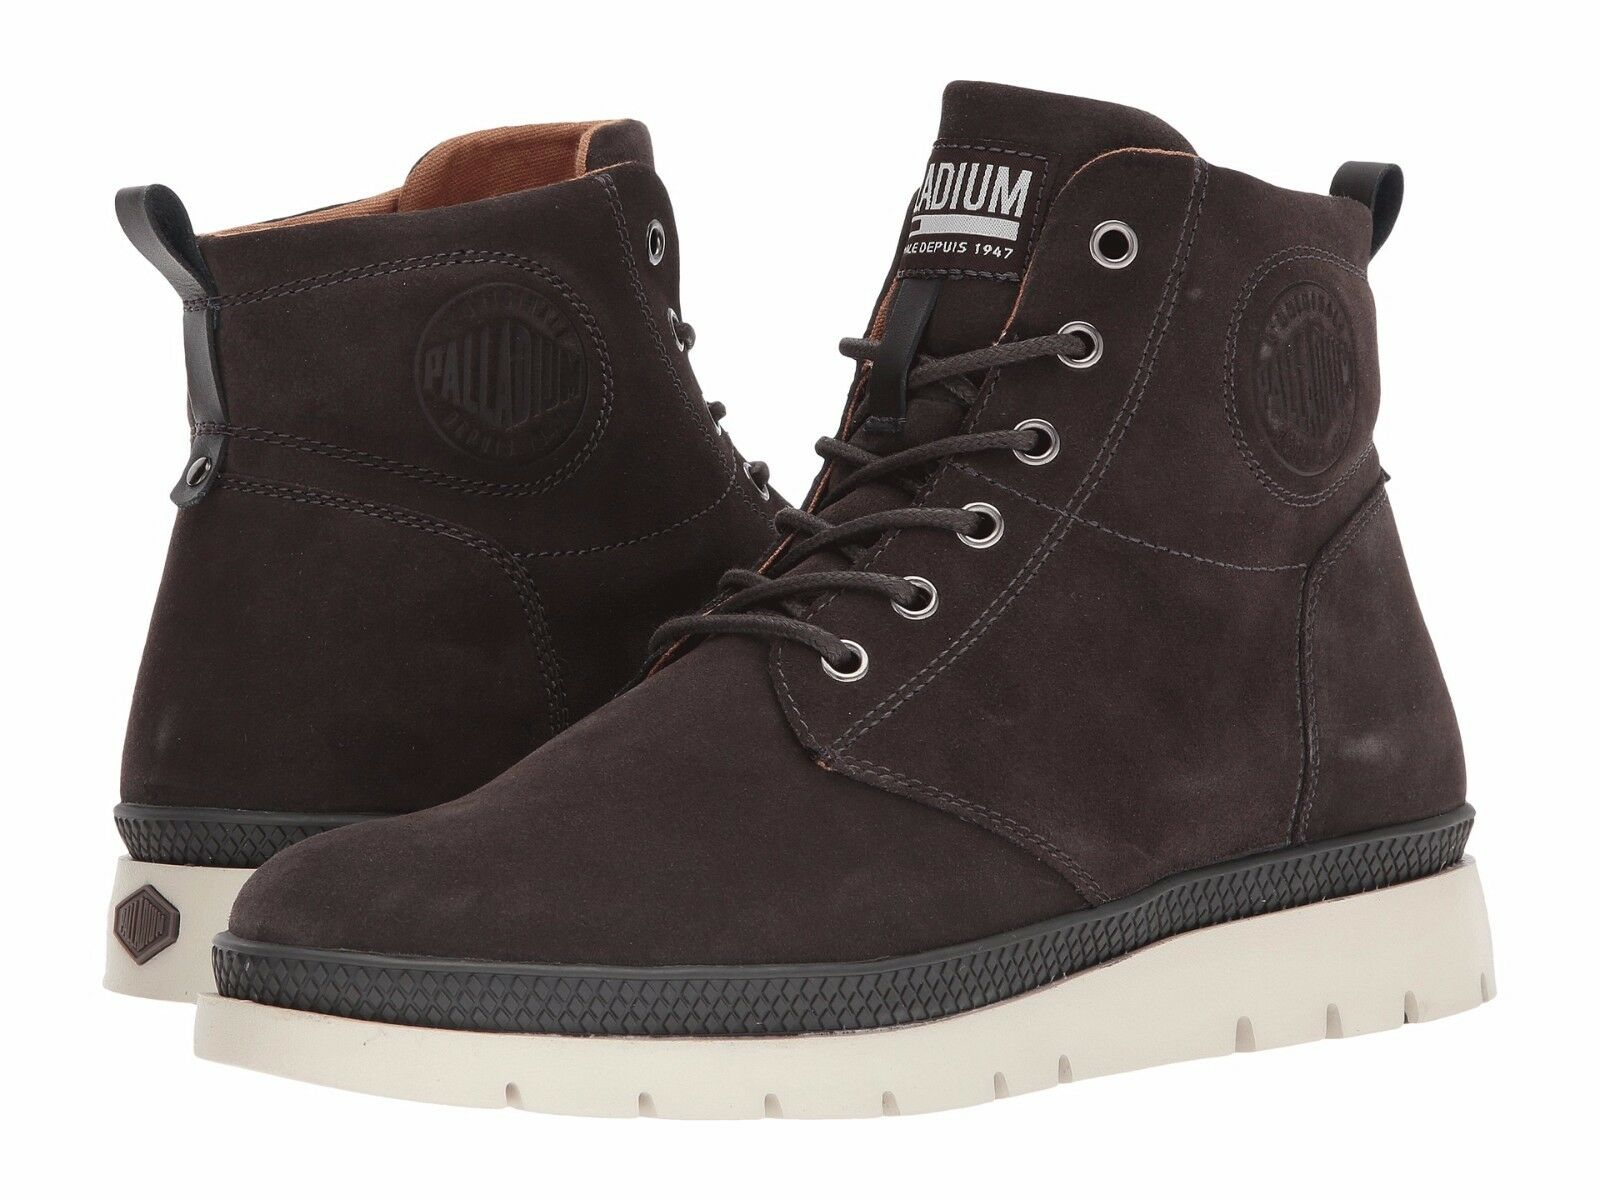 Palladium Men's Pallasider Mid Suede White Sole Casual Boots Brown Sizes 8.5-13